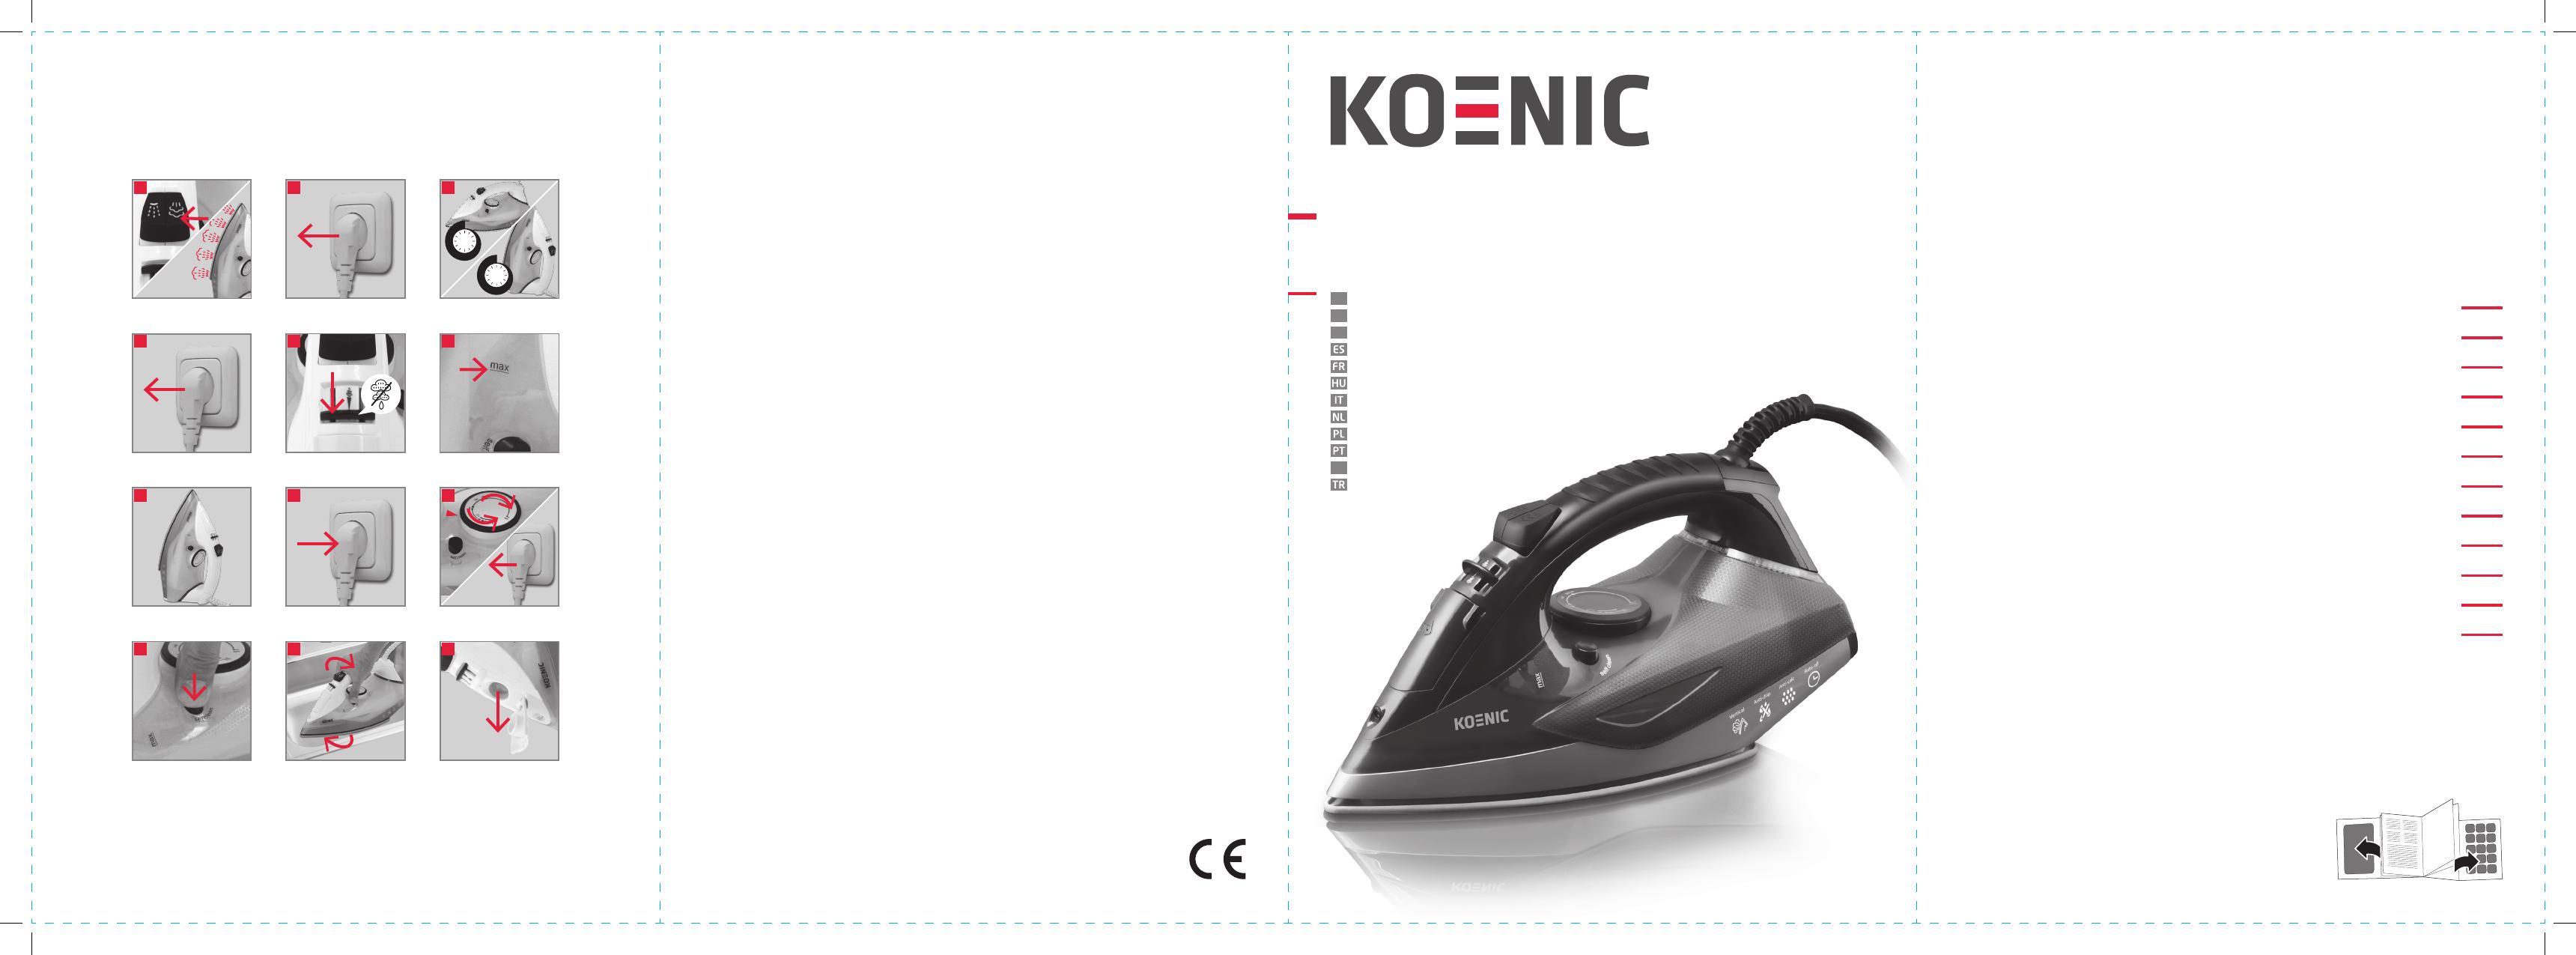 Koenic KSI 4310 Bedienungsanleitung